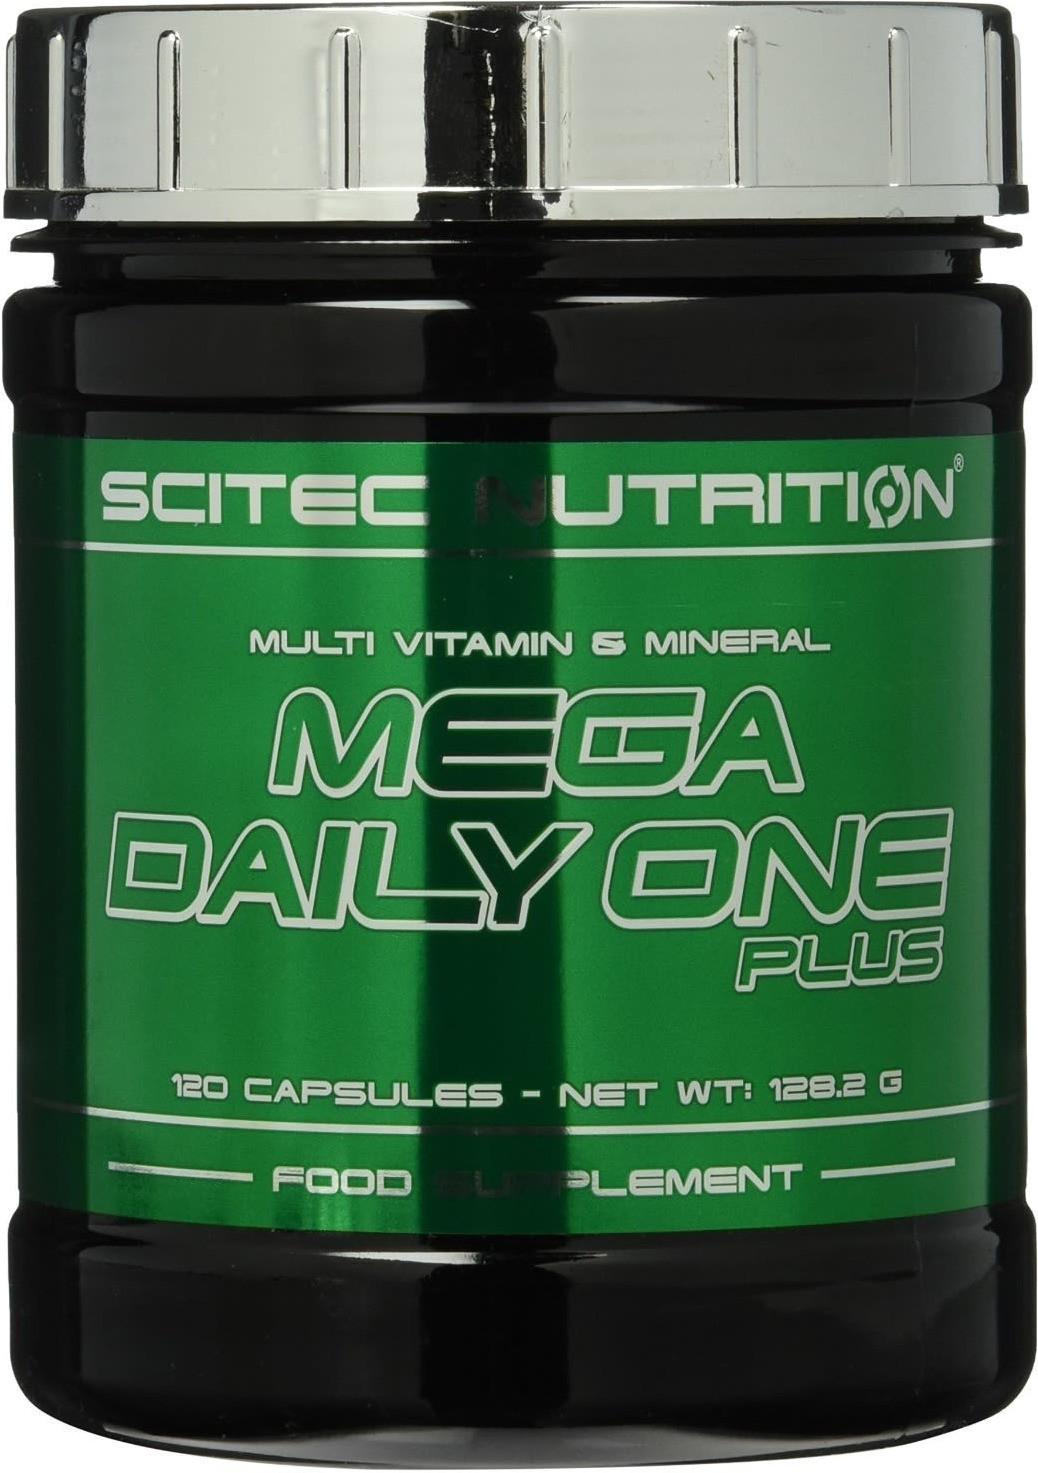 Scitec Nutrition Mega Daily One Plus 120 Stück